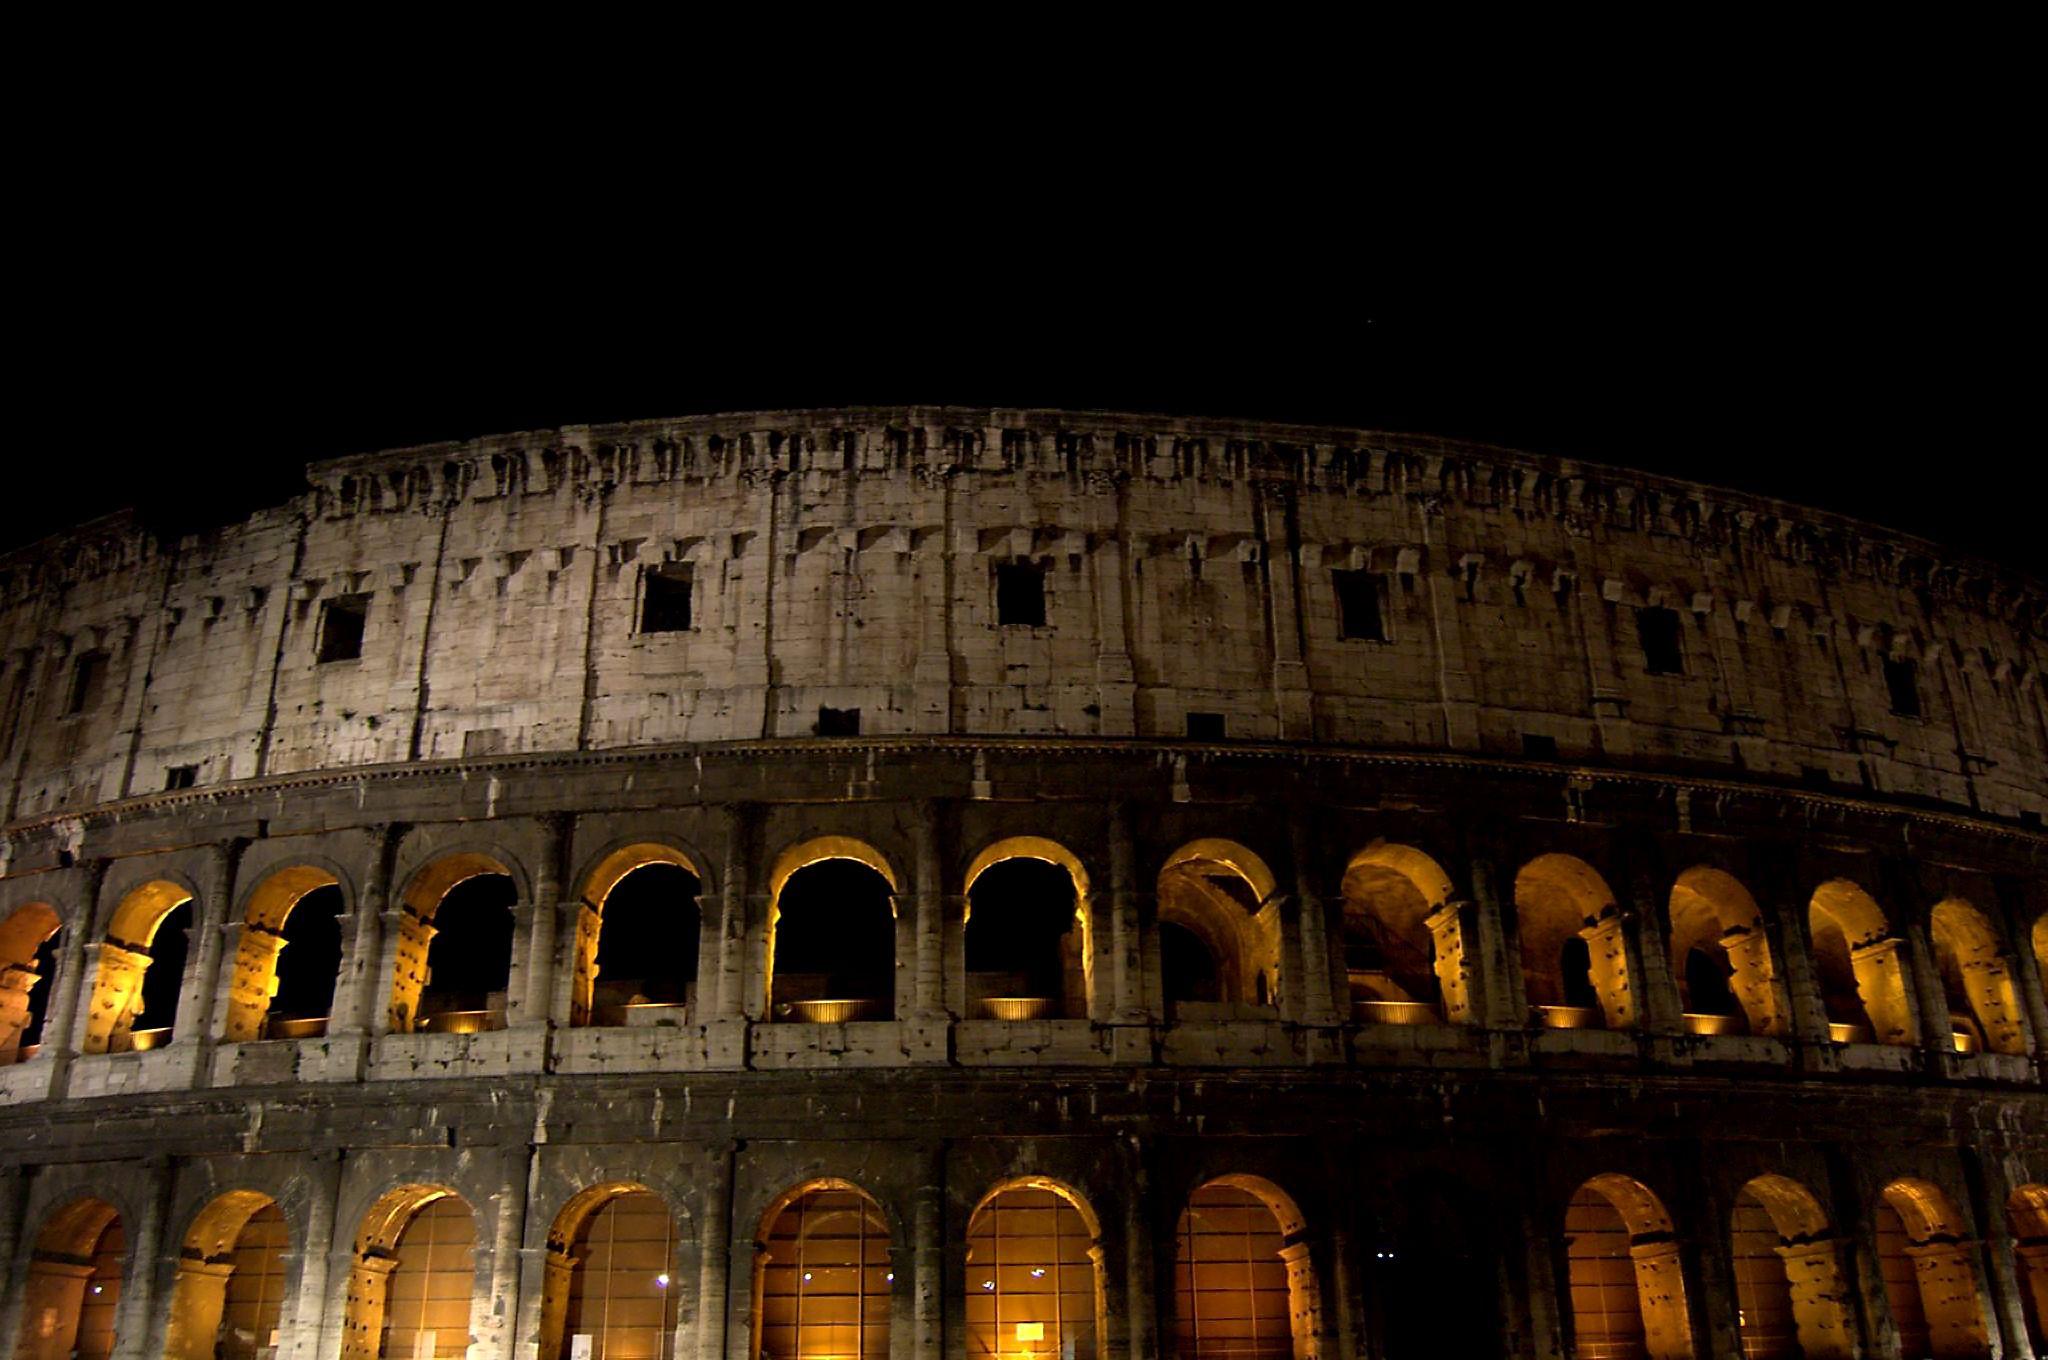 Colosseo by PatriziaCortellessa